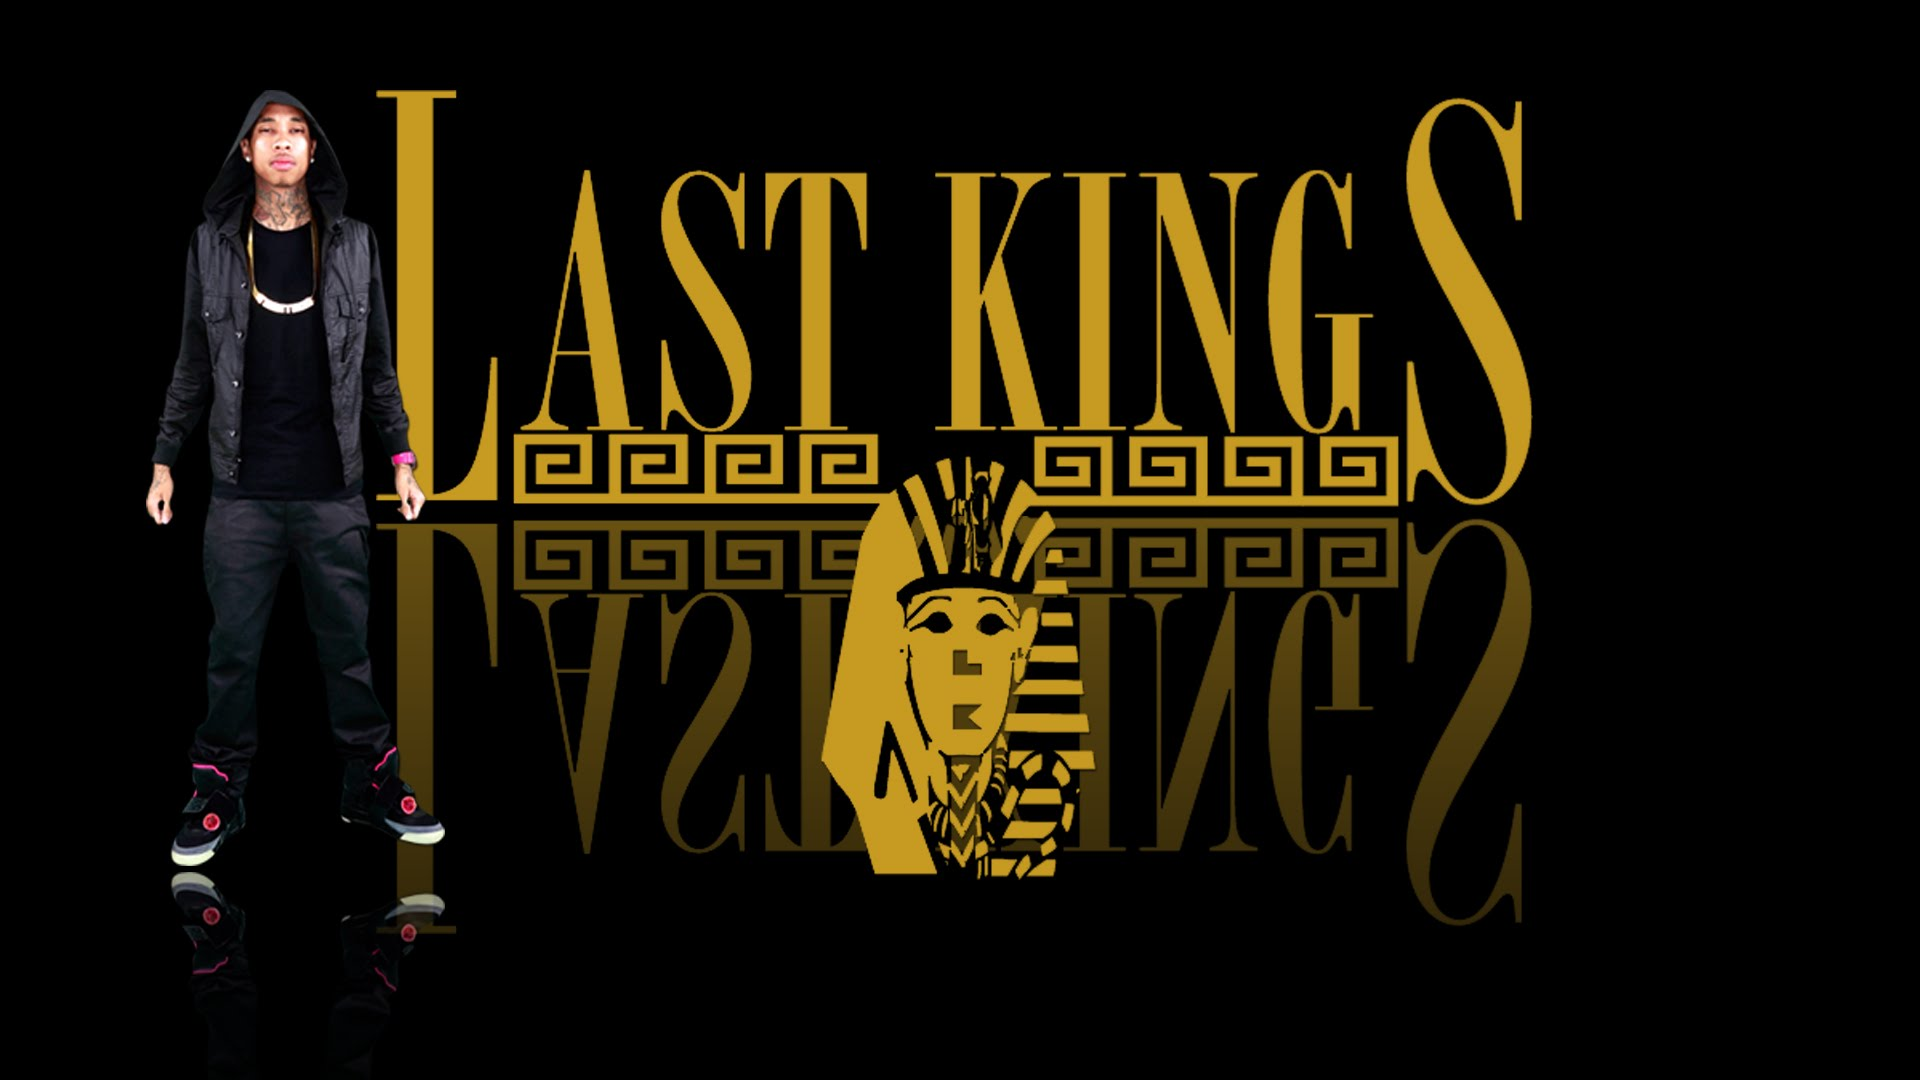 Last Kings Logos